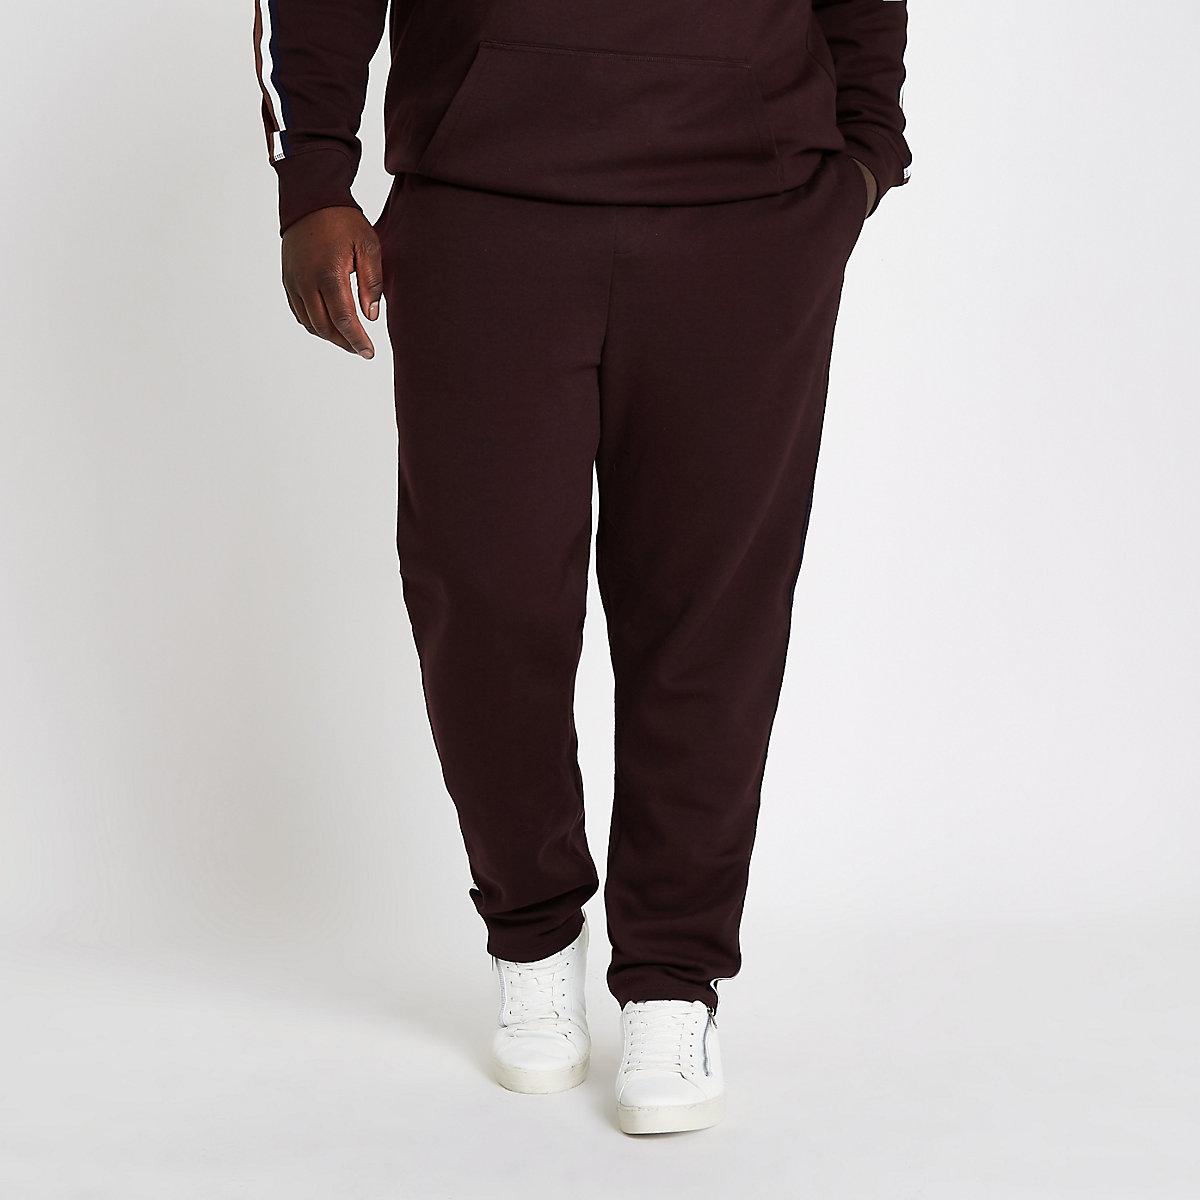 Big and Tall – Dunkelrote Slim Fit Jogginghose